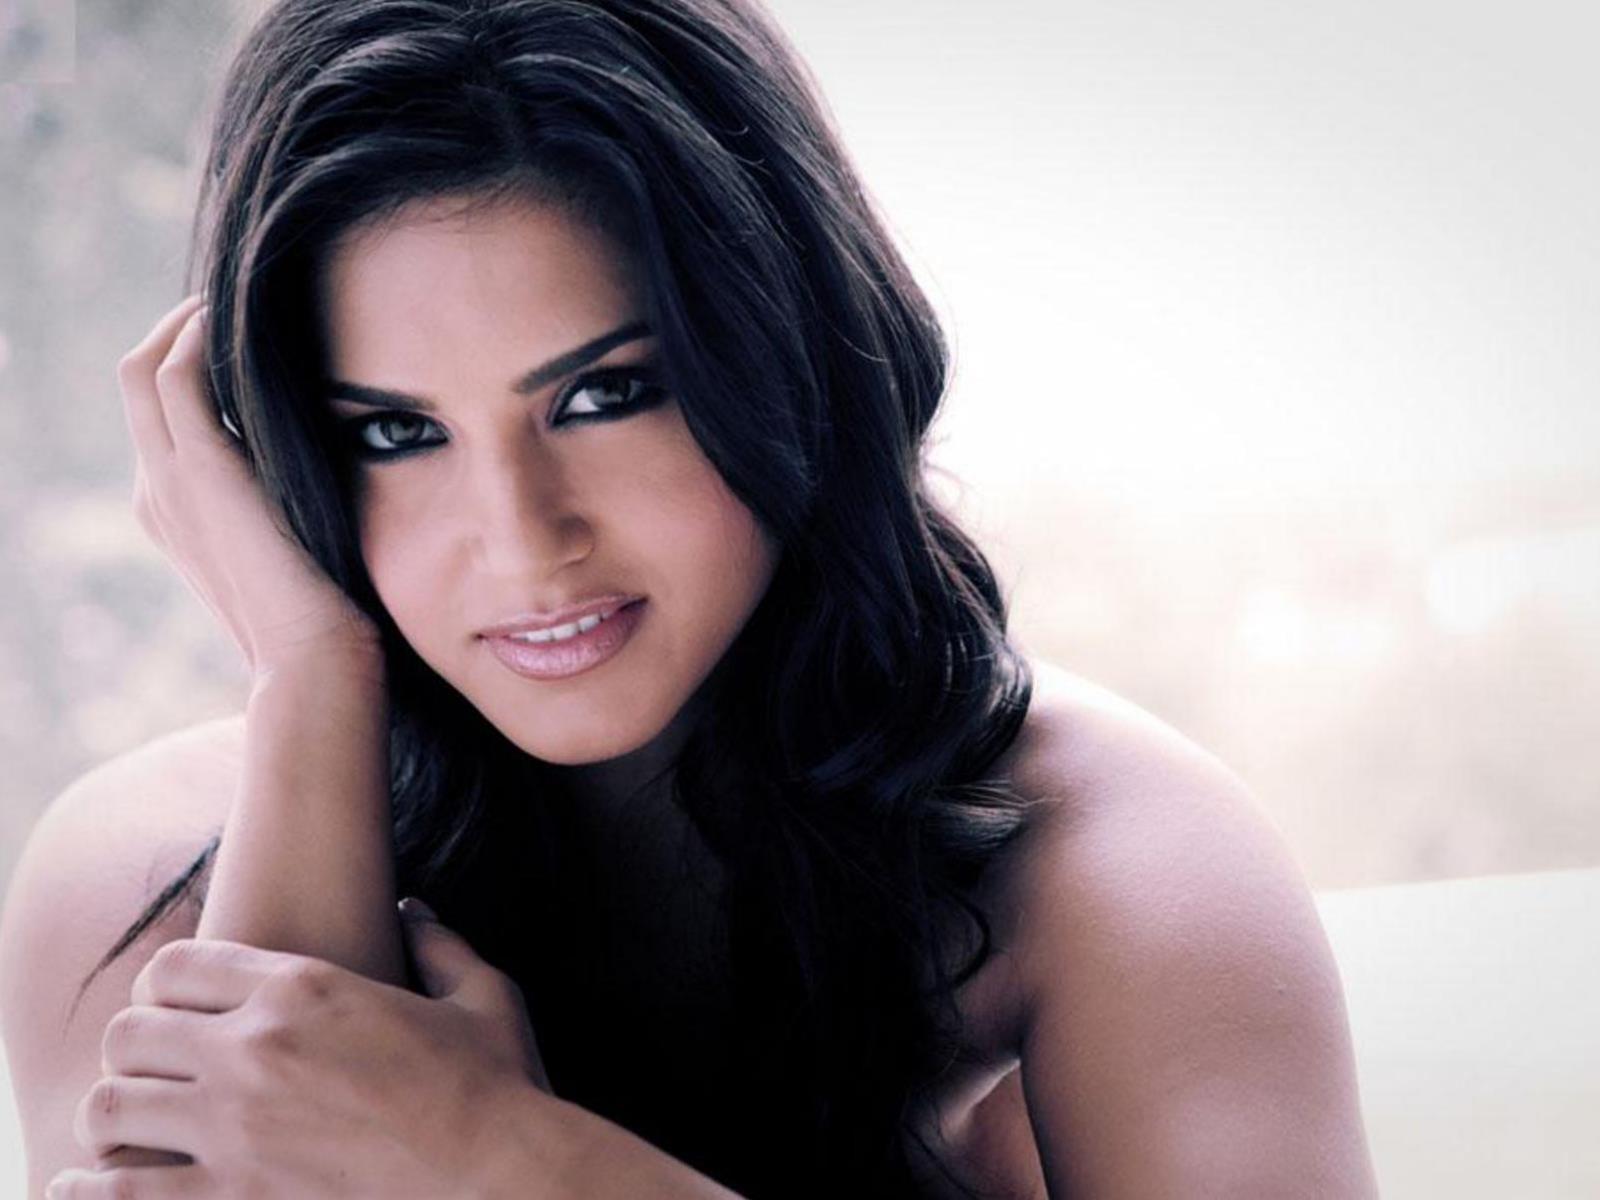 Sunny Leone Wallpaper | Bollywood Actresses Wallpaper | Free Bollywood ...